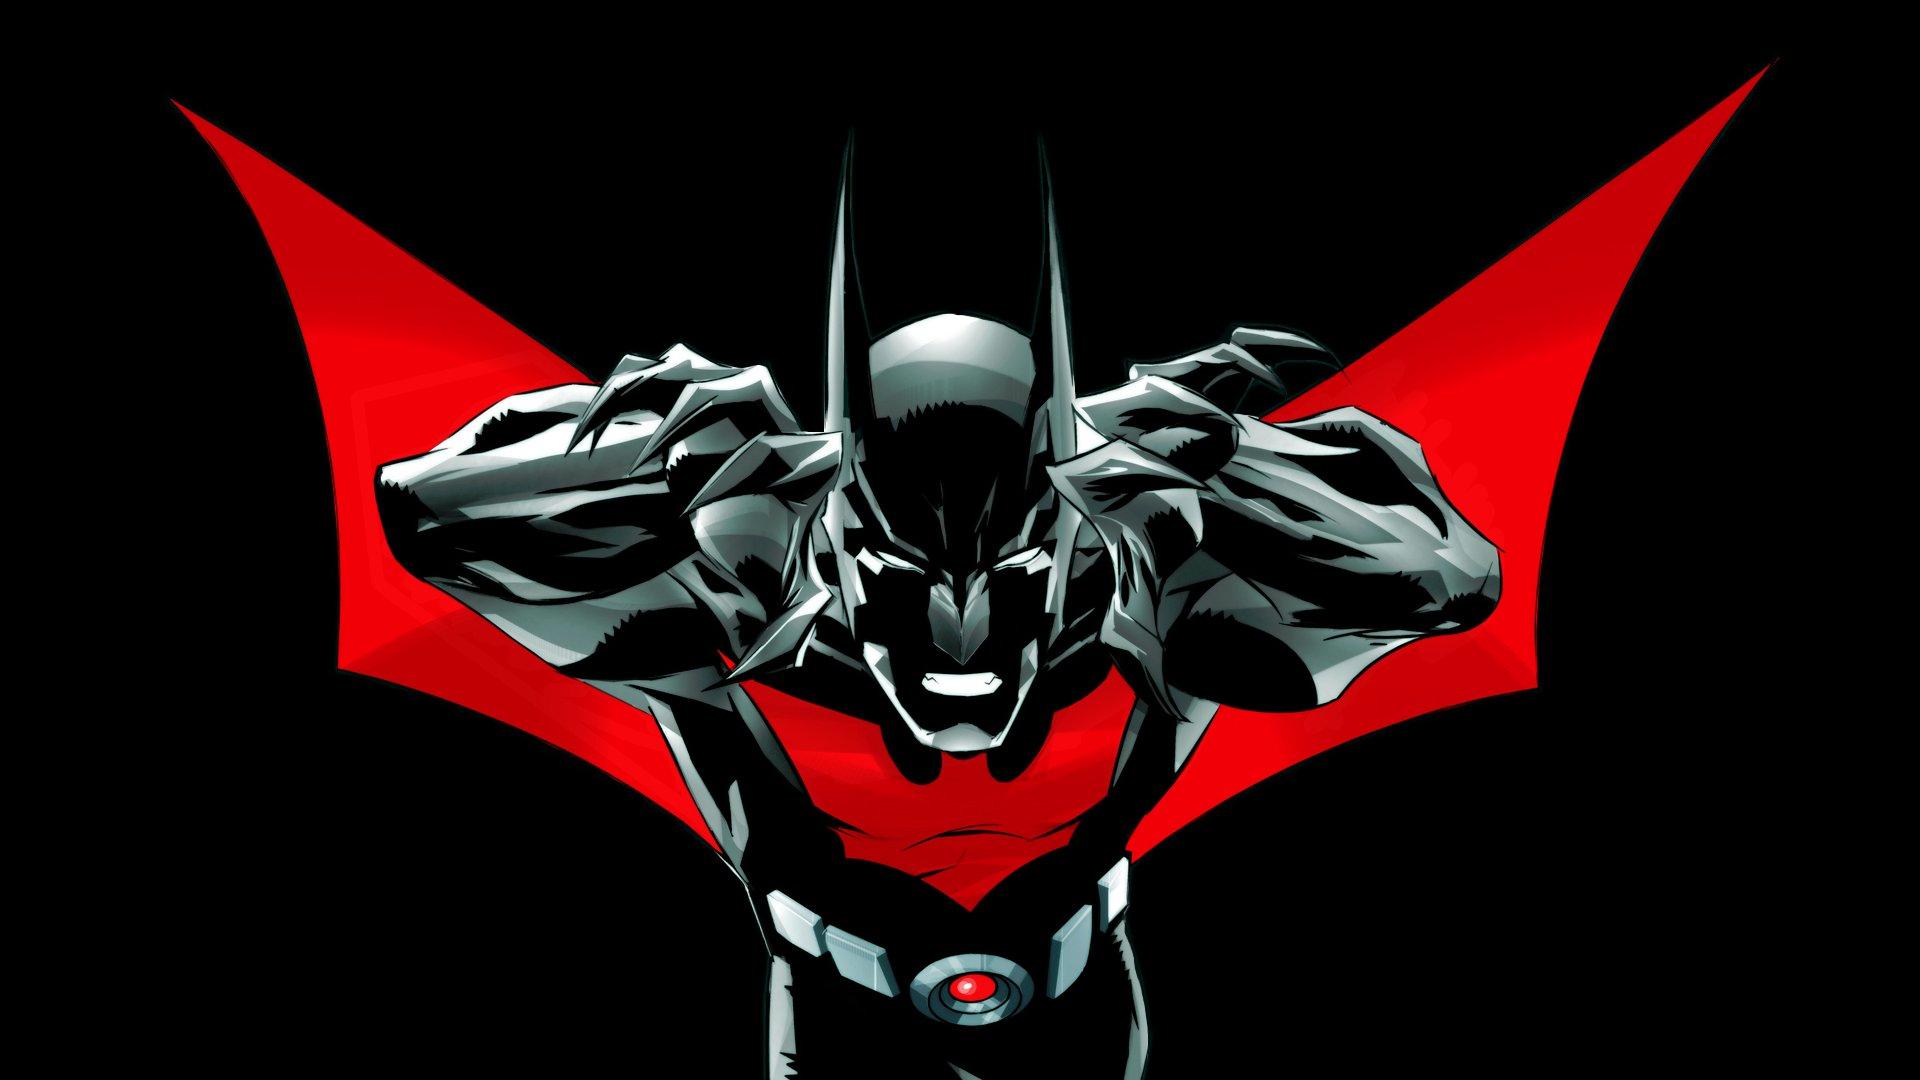 HD Quality Wallpaper | Collection: Cartoon, 1920x1080 Batman Beyond